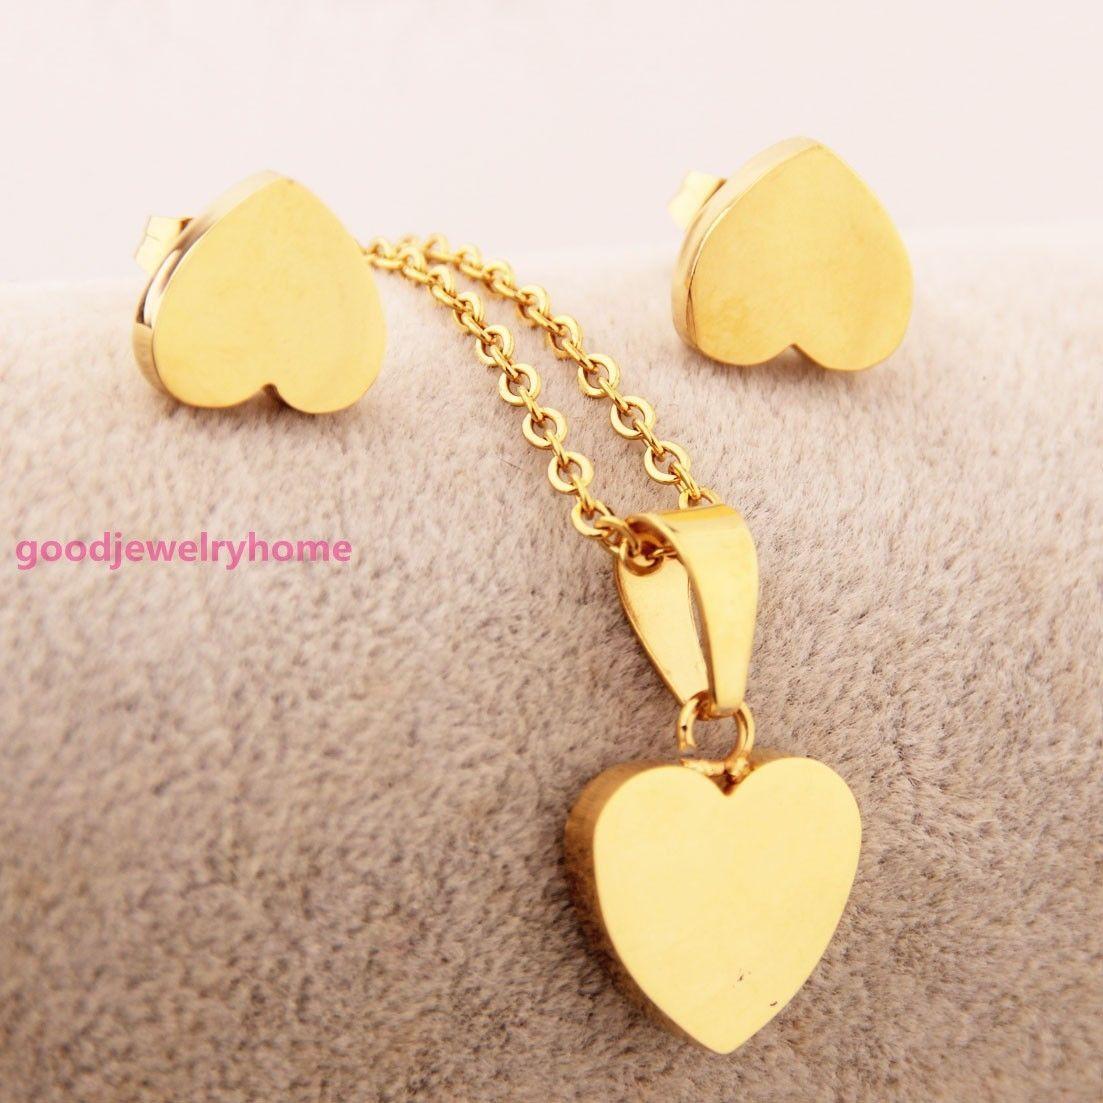 Womens stainless steel gold love heart pendant necklace earrings